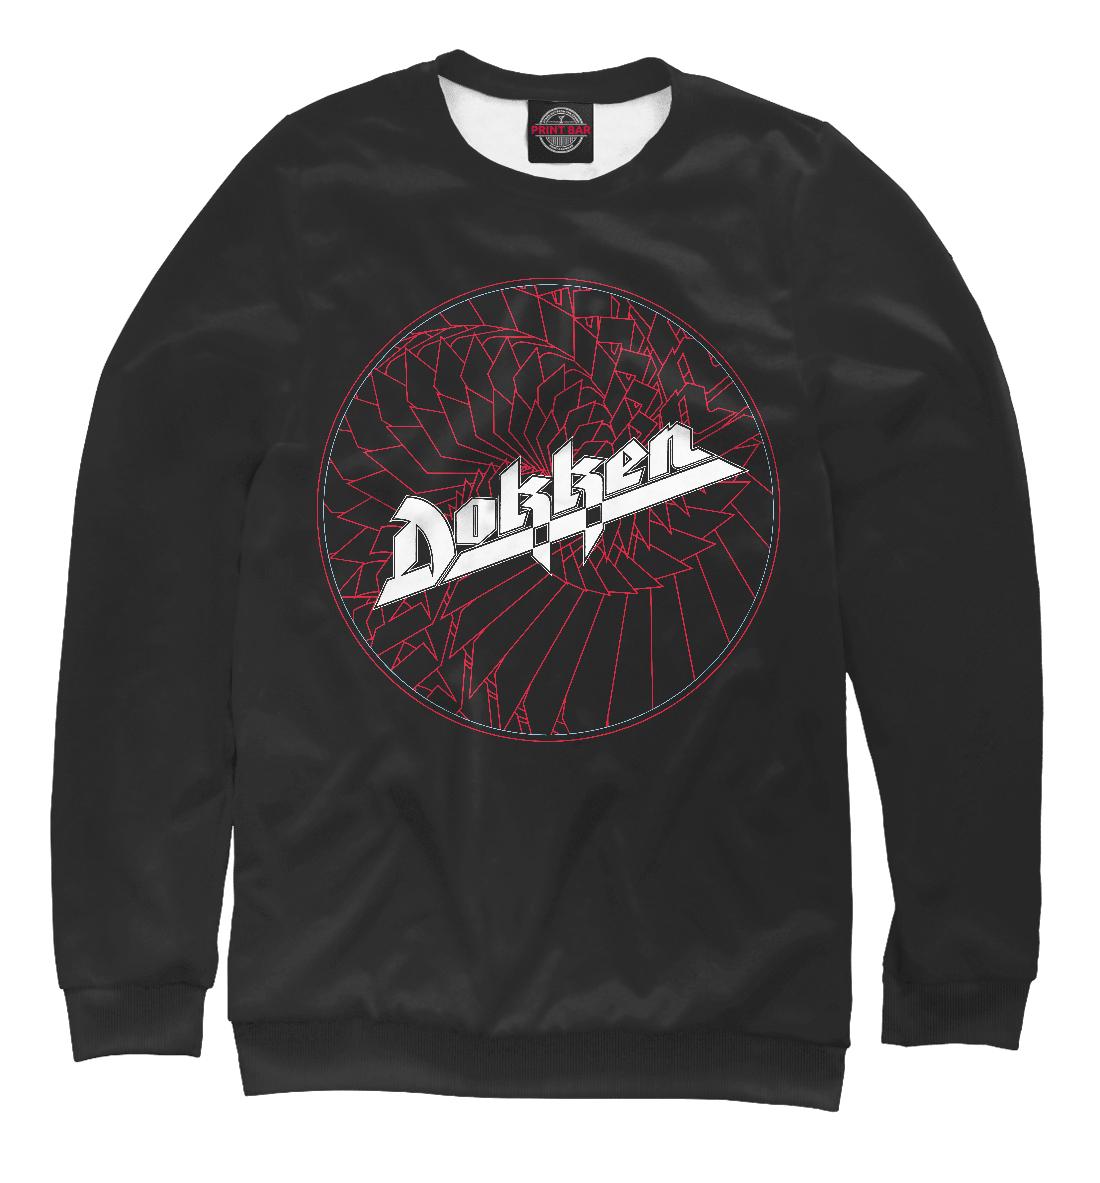 Купить Dokken: Breaking The Chains, Printbar, Свитшоты, APD-956707-swi-2